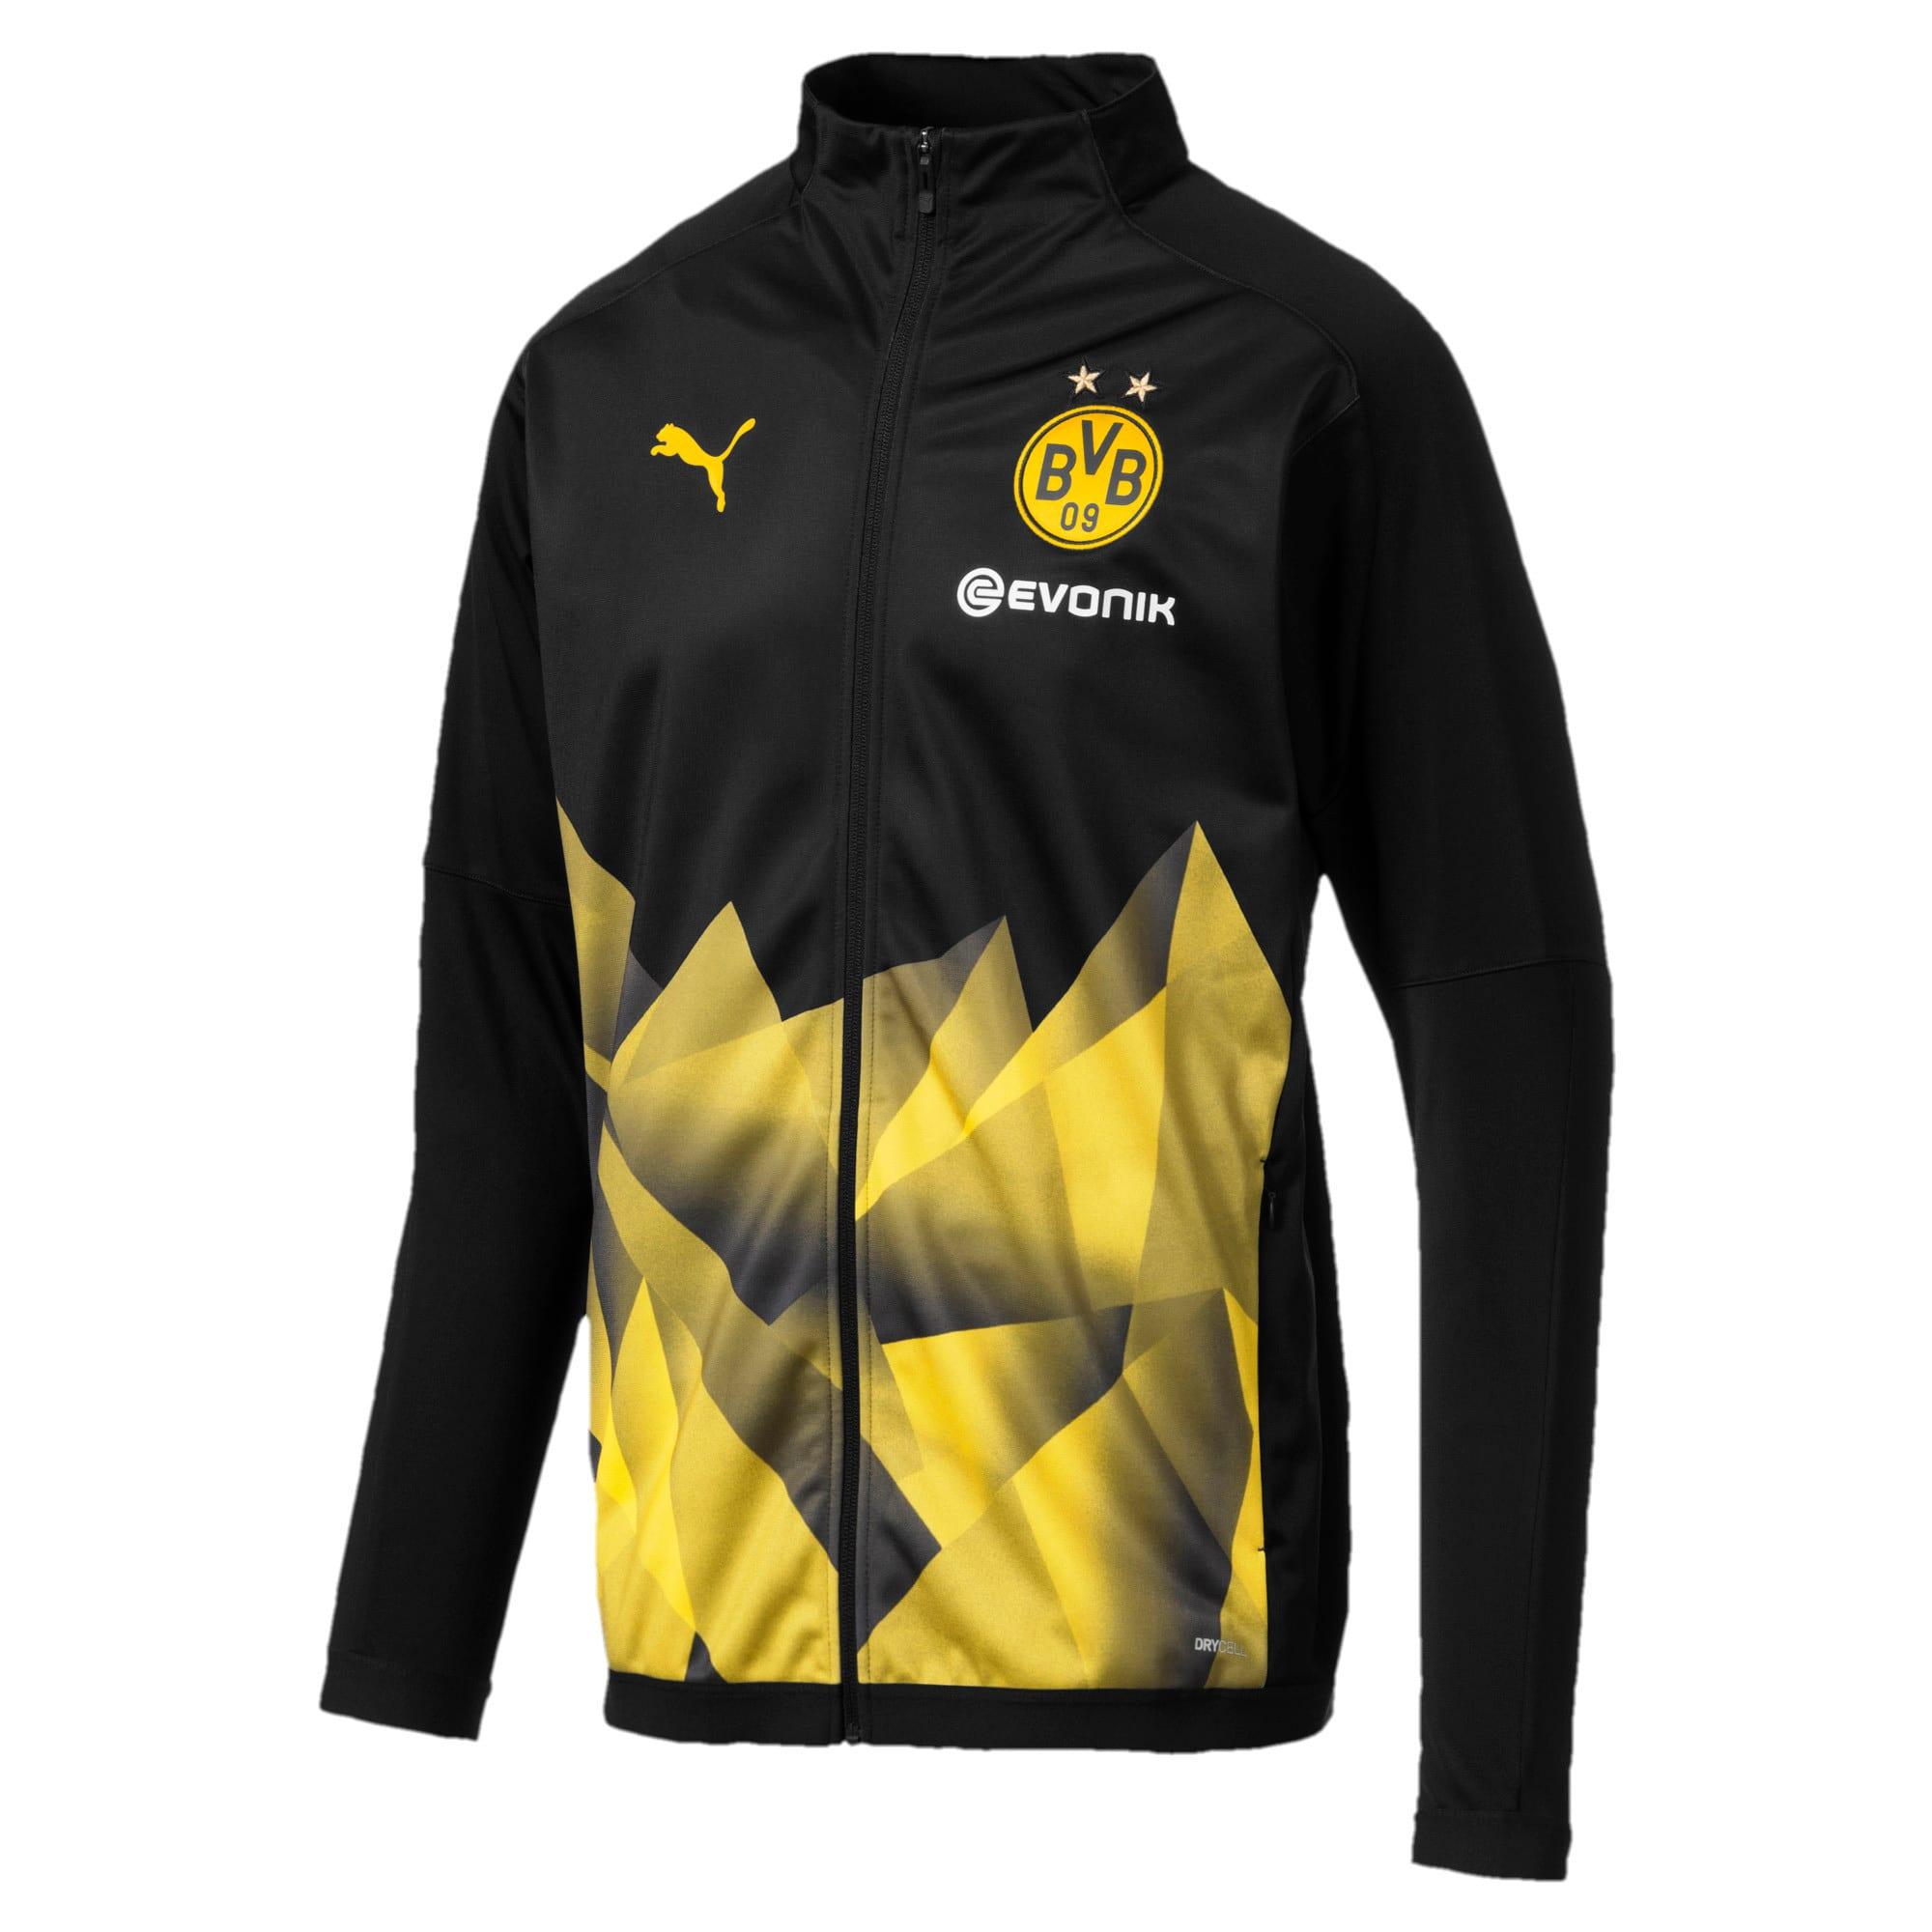 Thumbnail 1 of BVB Men's International Stadium Jacket, Puma Black-Cyber Yellow, medium